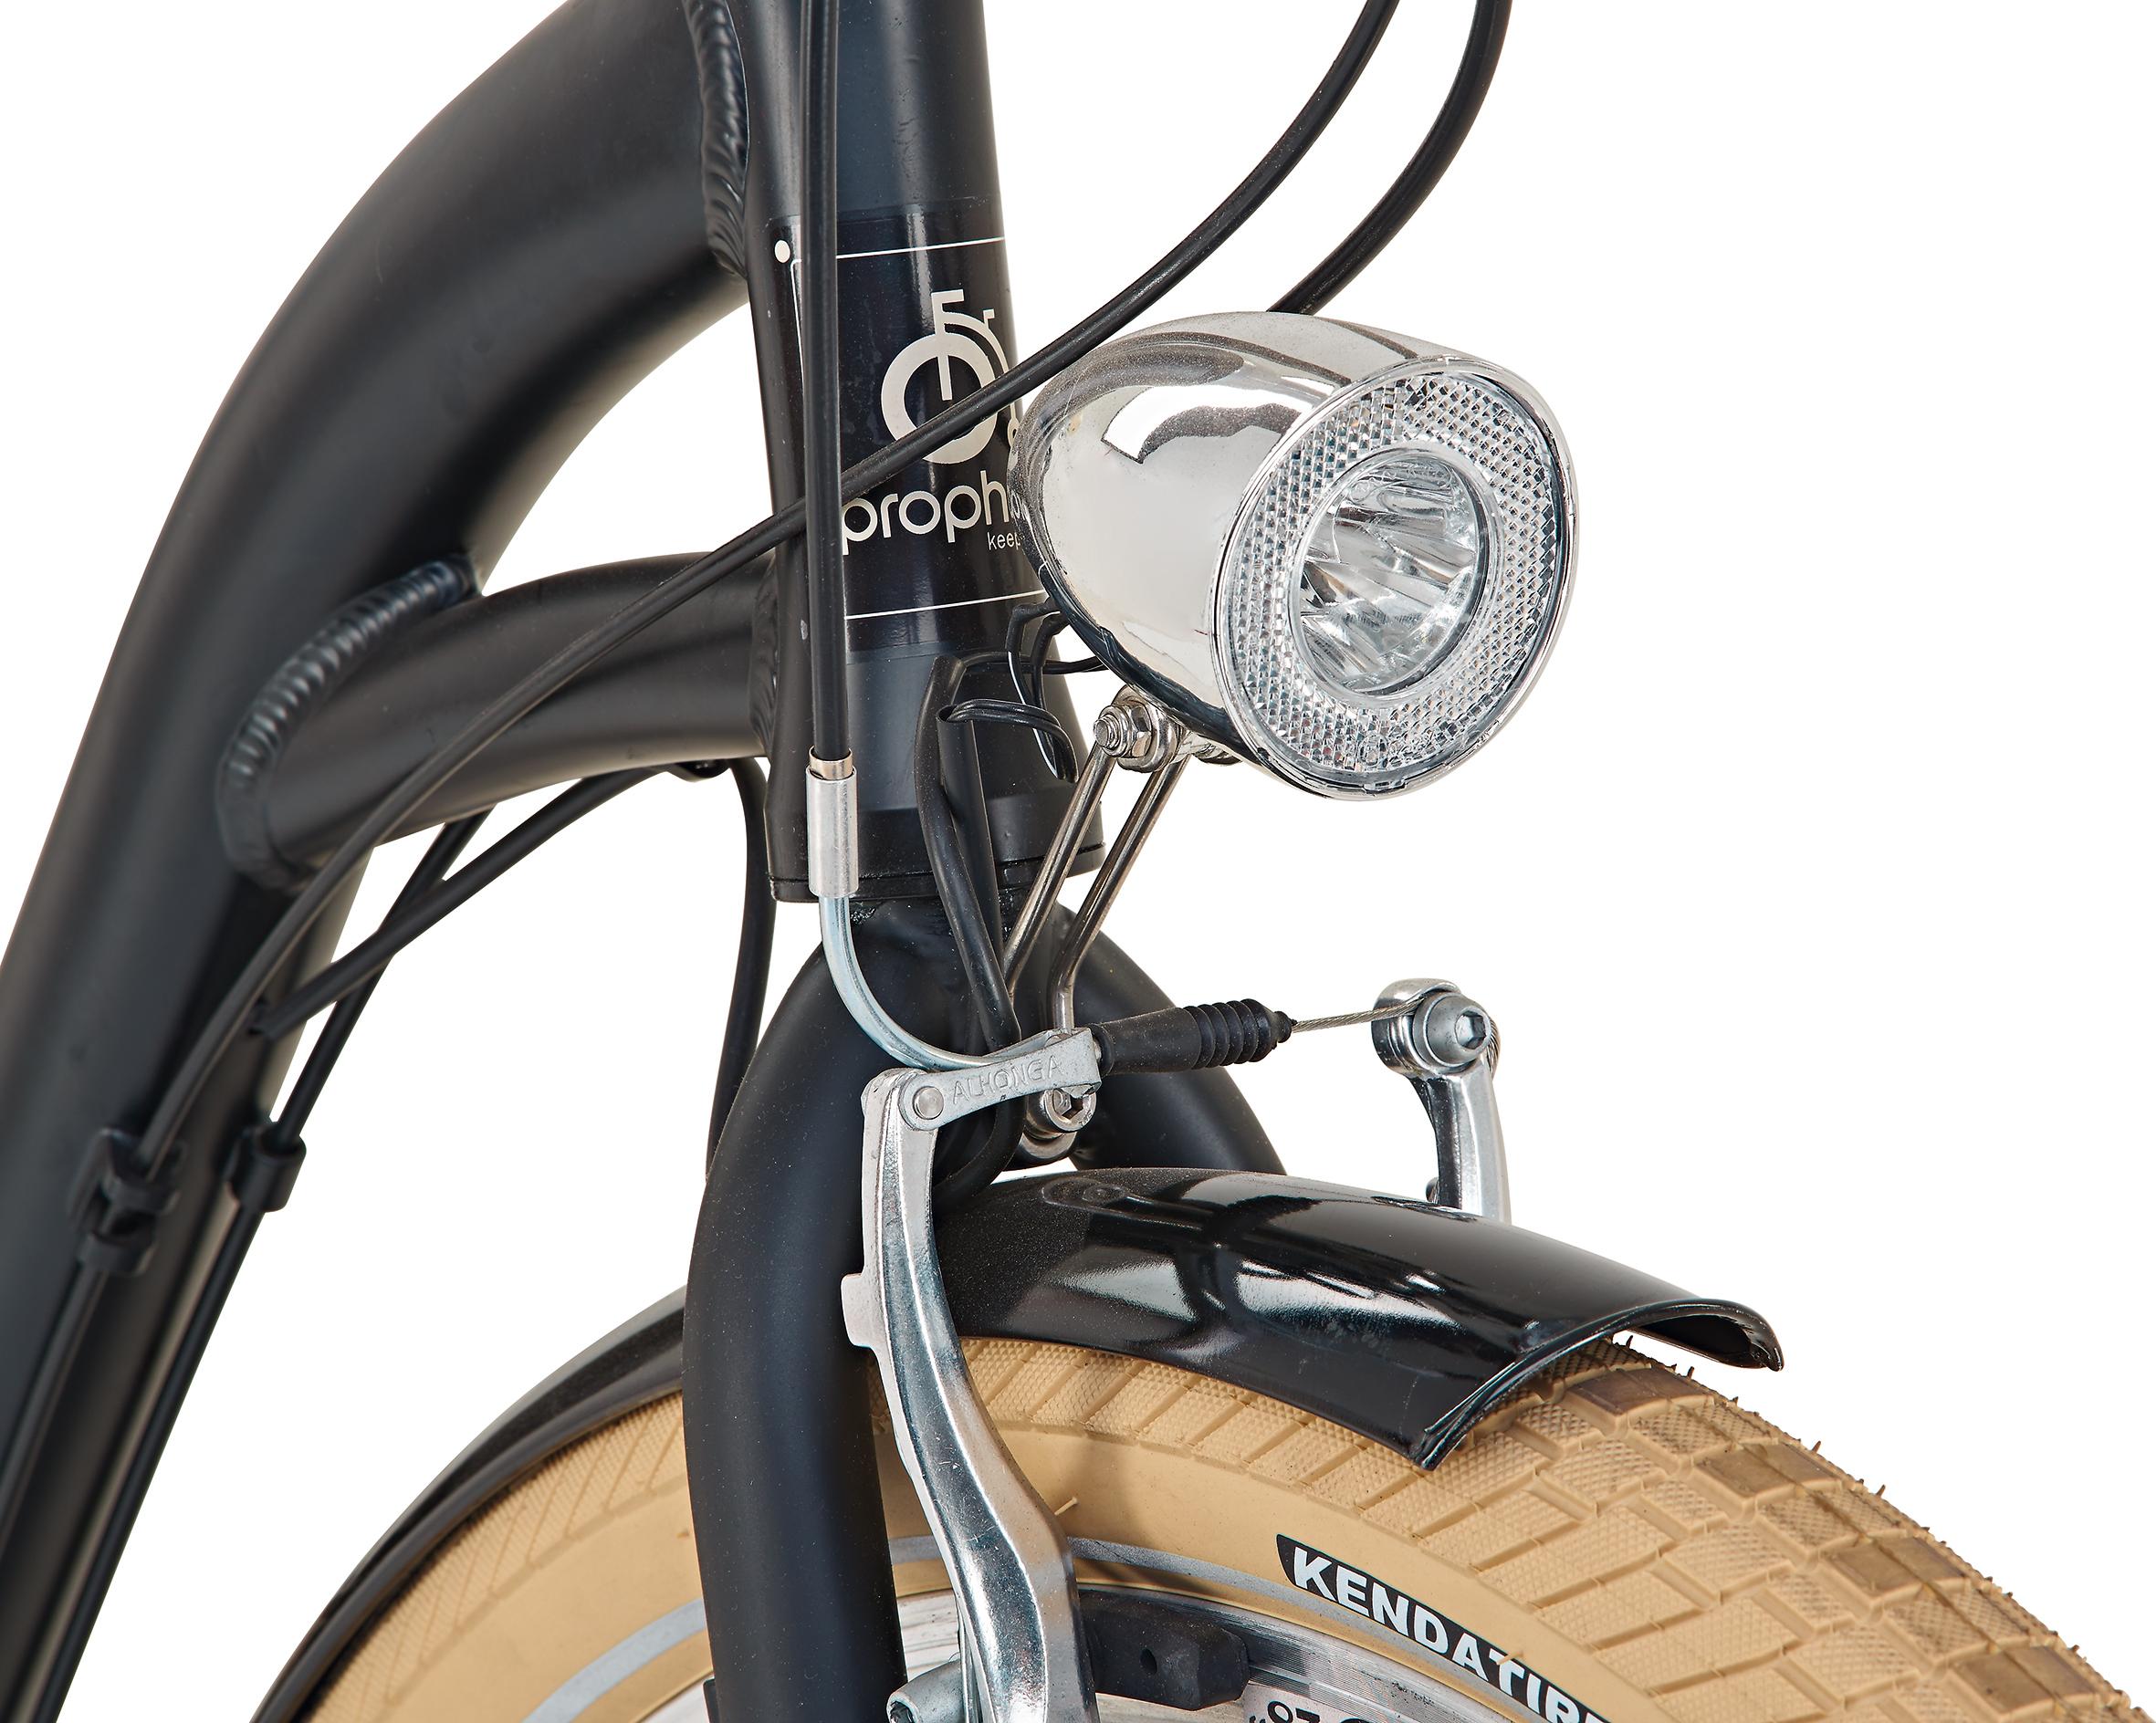 "Prophete Fahrrad / Cityrad Geniesser 9.2 City Bike 28"" Damen Bild 6"